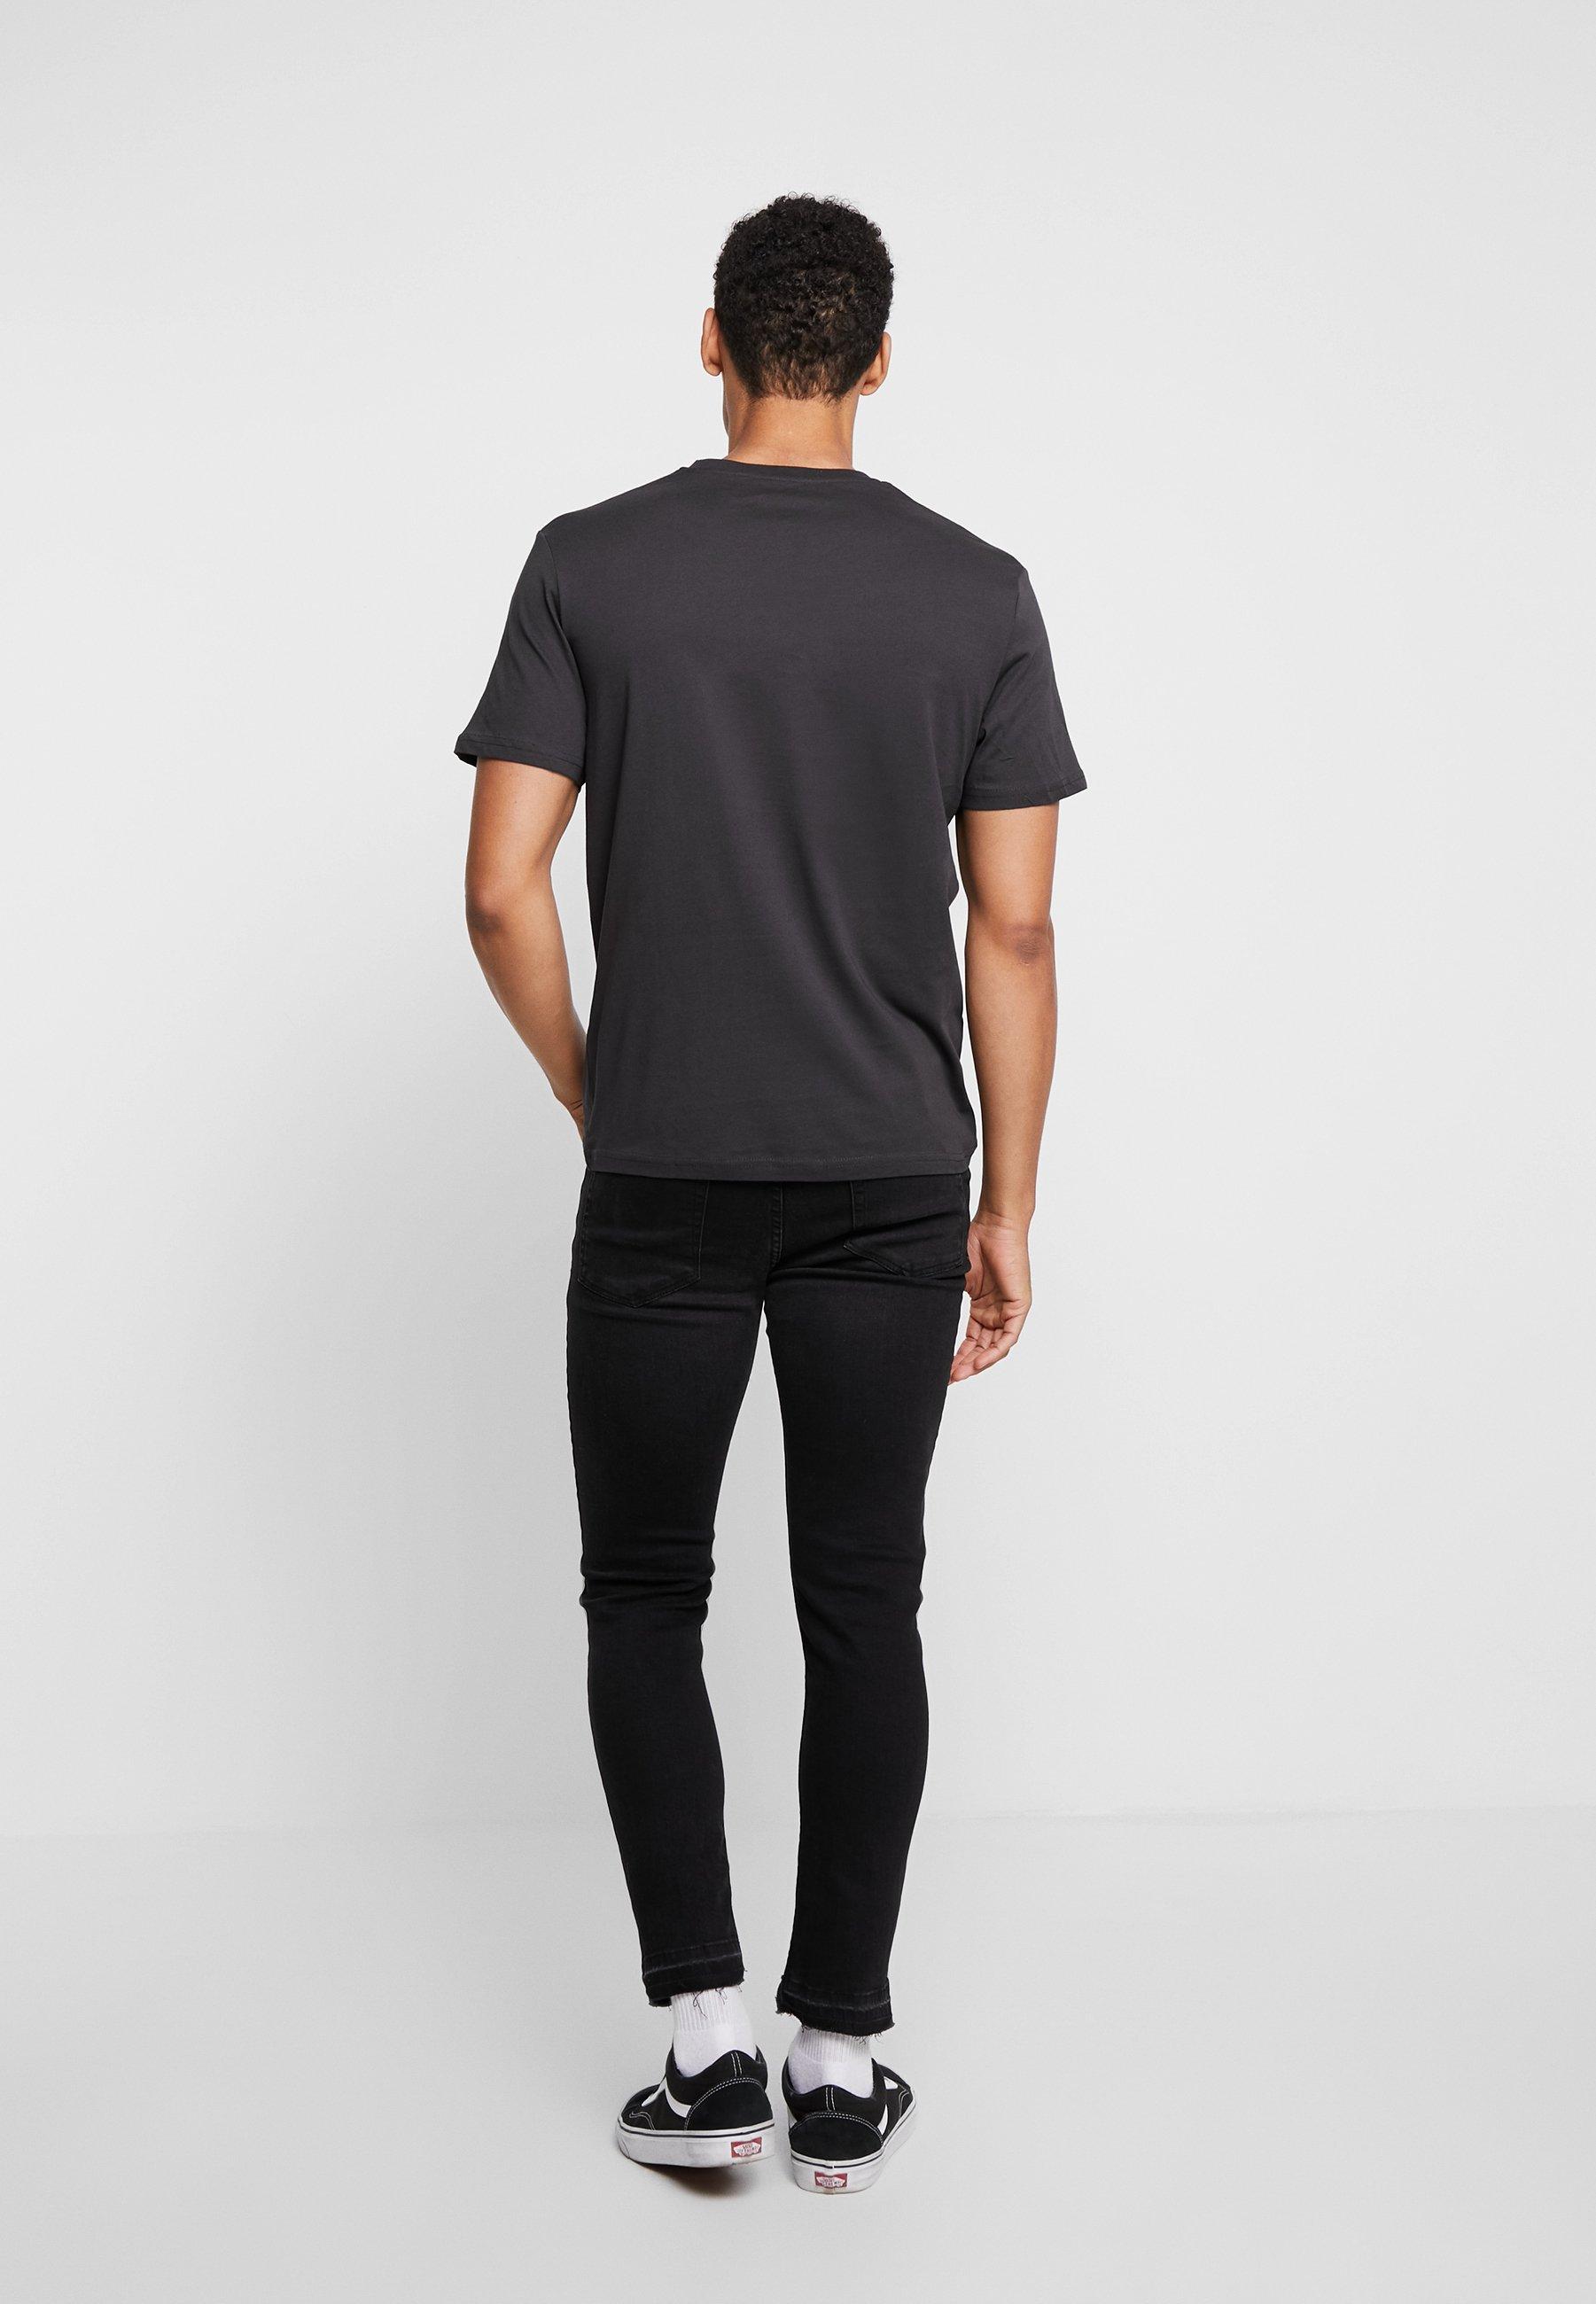 ImpriméPhanton Grey Dark Tailor shirt T Tom DYIWHE29